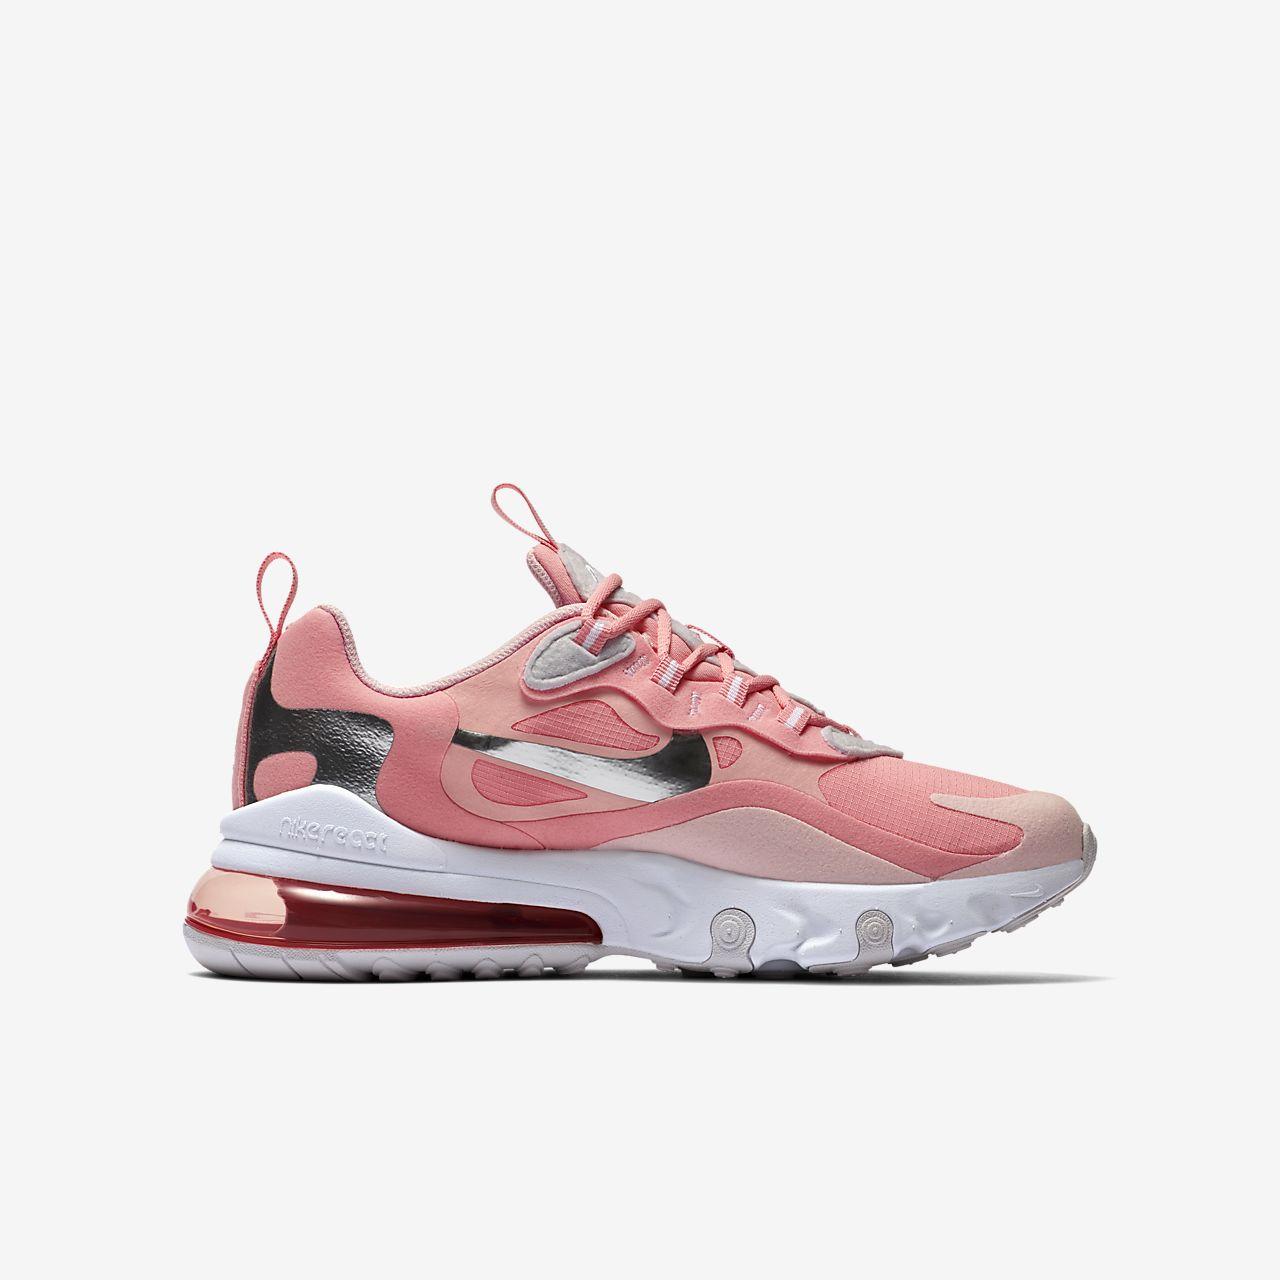 Nike scarpa Nike air max 270 react ragazzi bianco